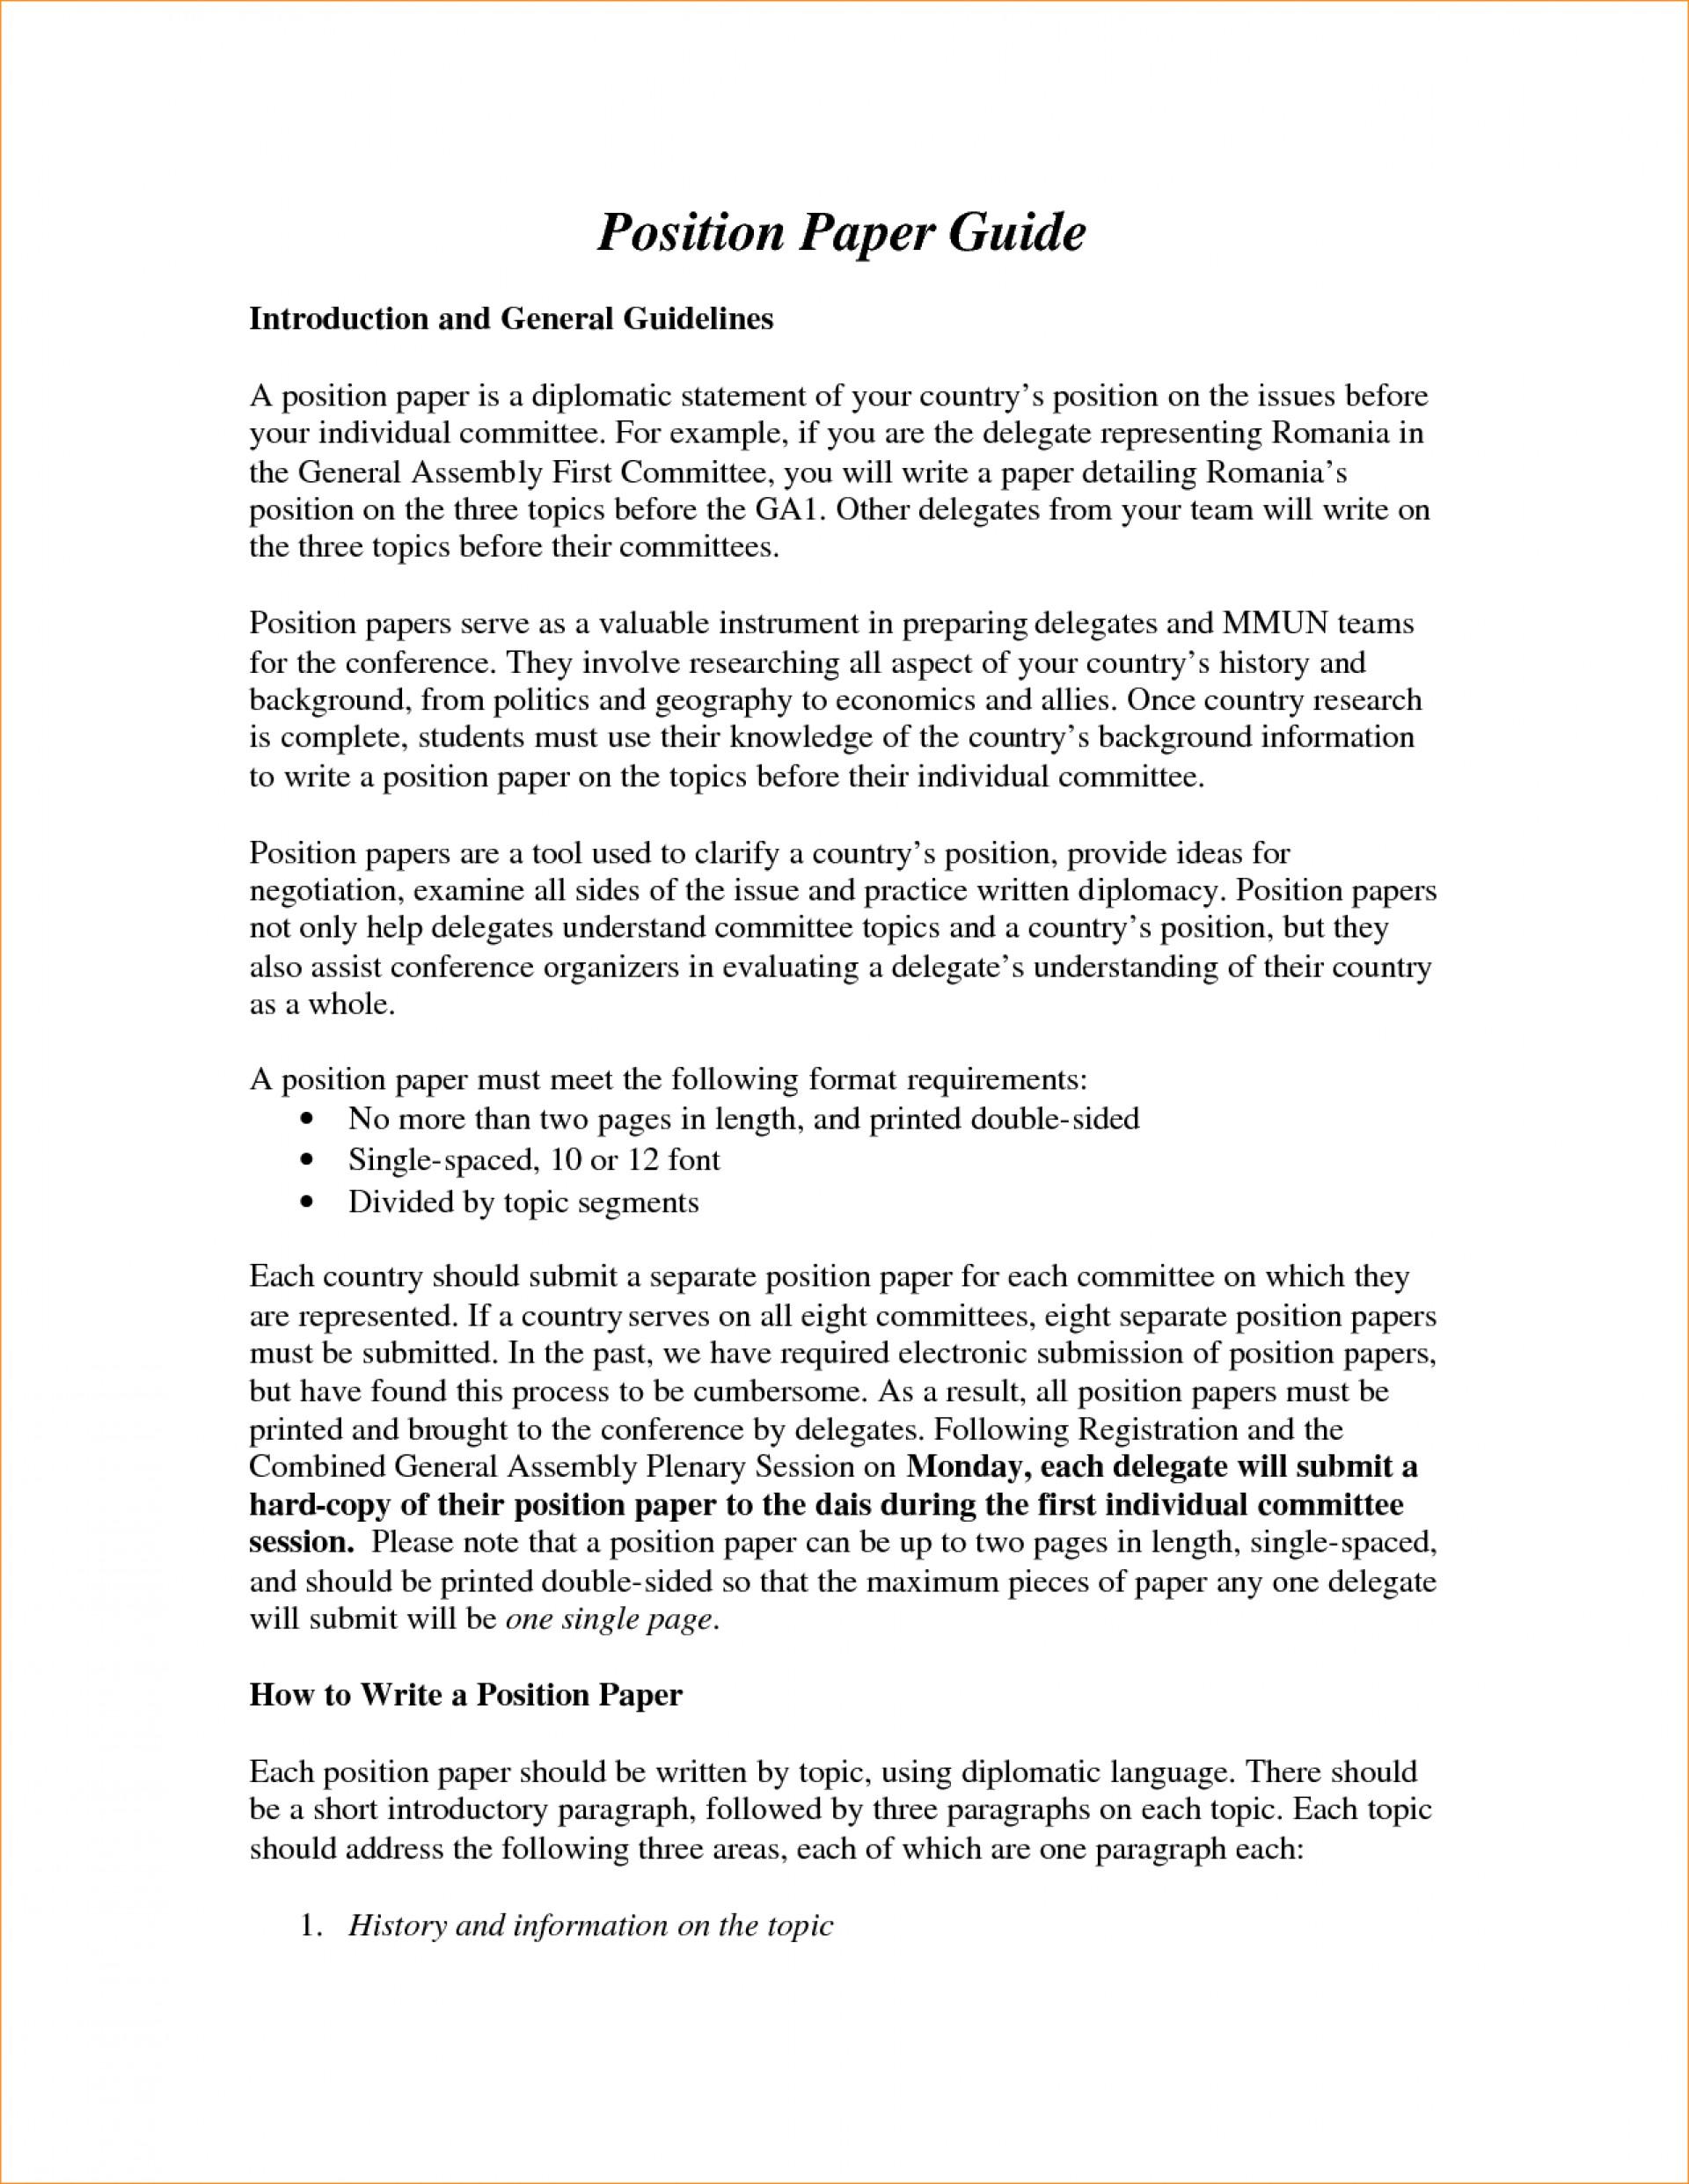 017 Proposal Essays Essay Topic List University English Healthy Business Topics How To Write An Nb5h37b5f7xw28ltnfxgk76t4bzg97dp4nqwy8dfnvygyylamvsc766sm7xx47bnmnxw78dfnz5c98lq Awesome Modest Examples On Bullying 1920